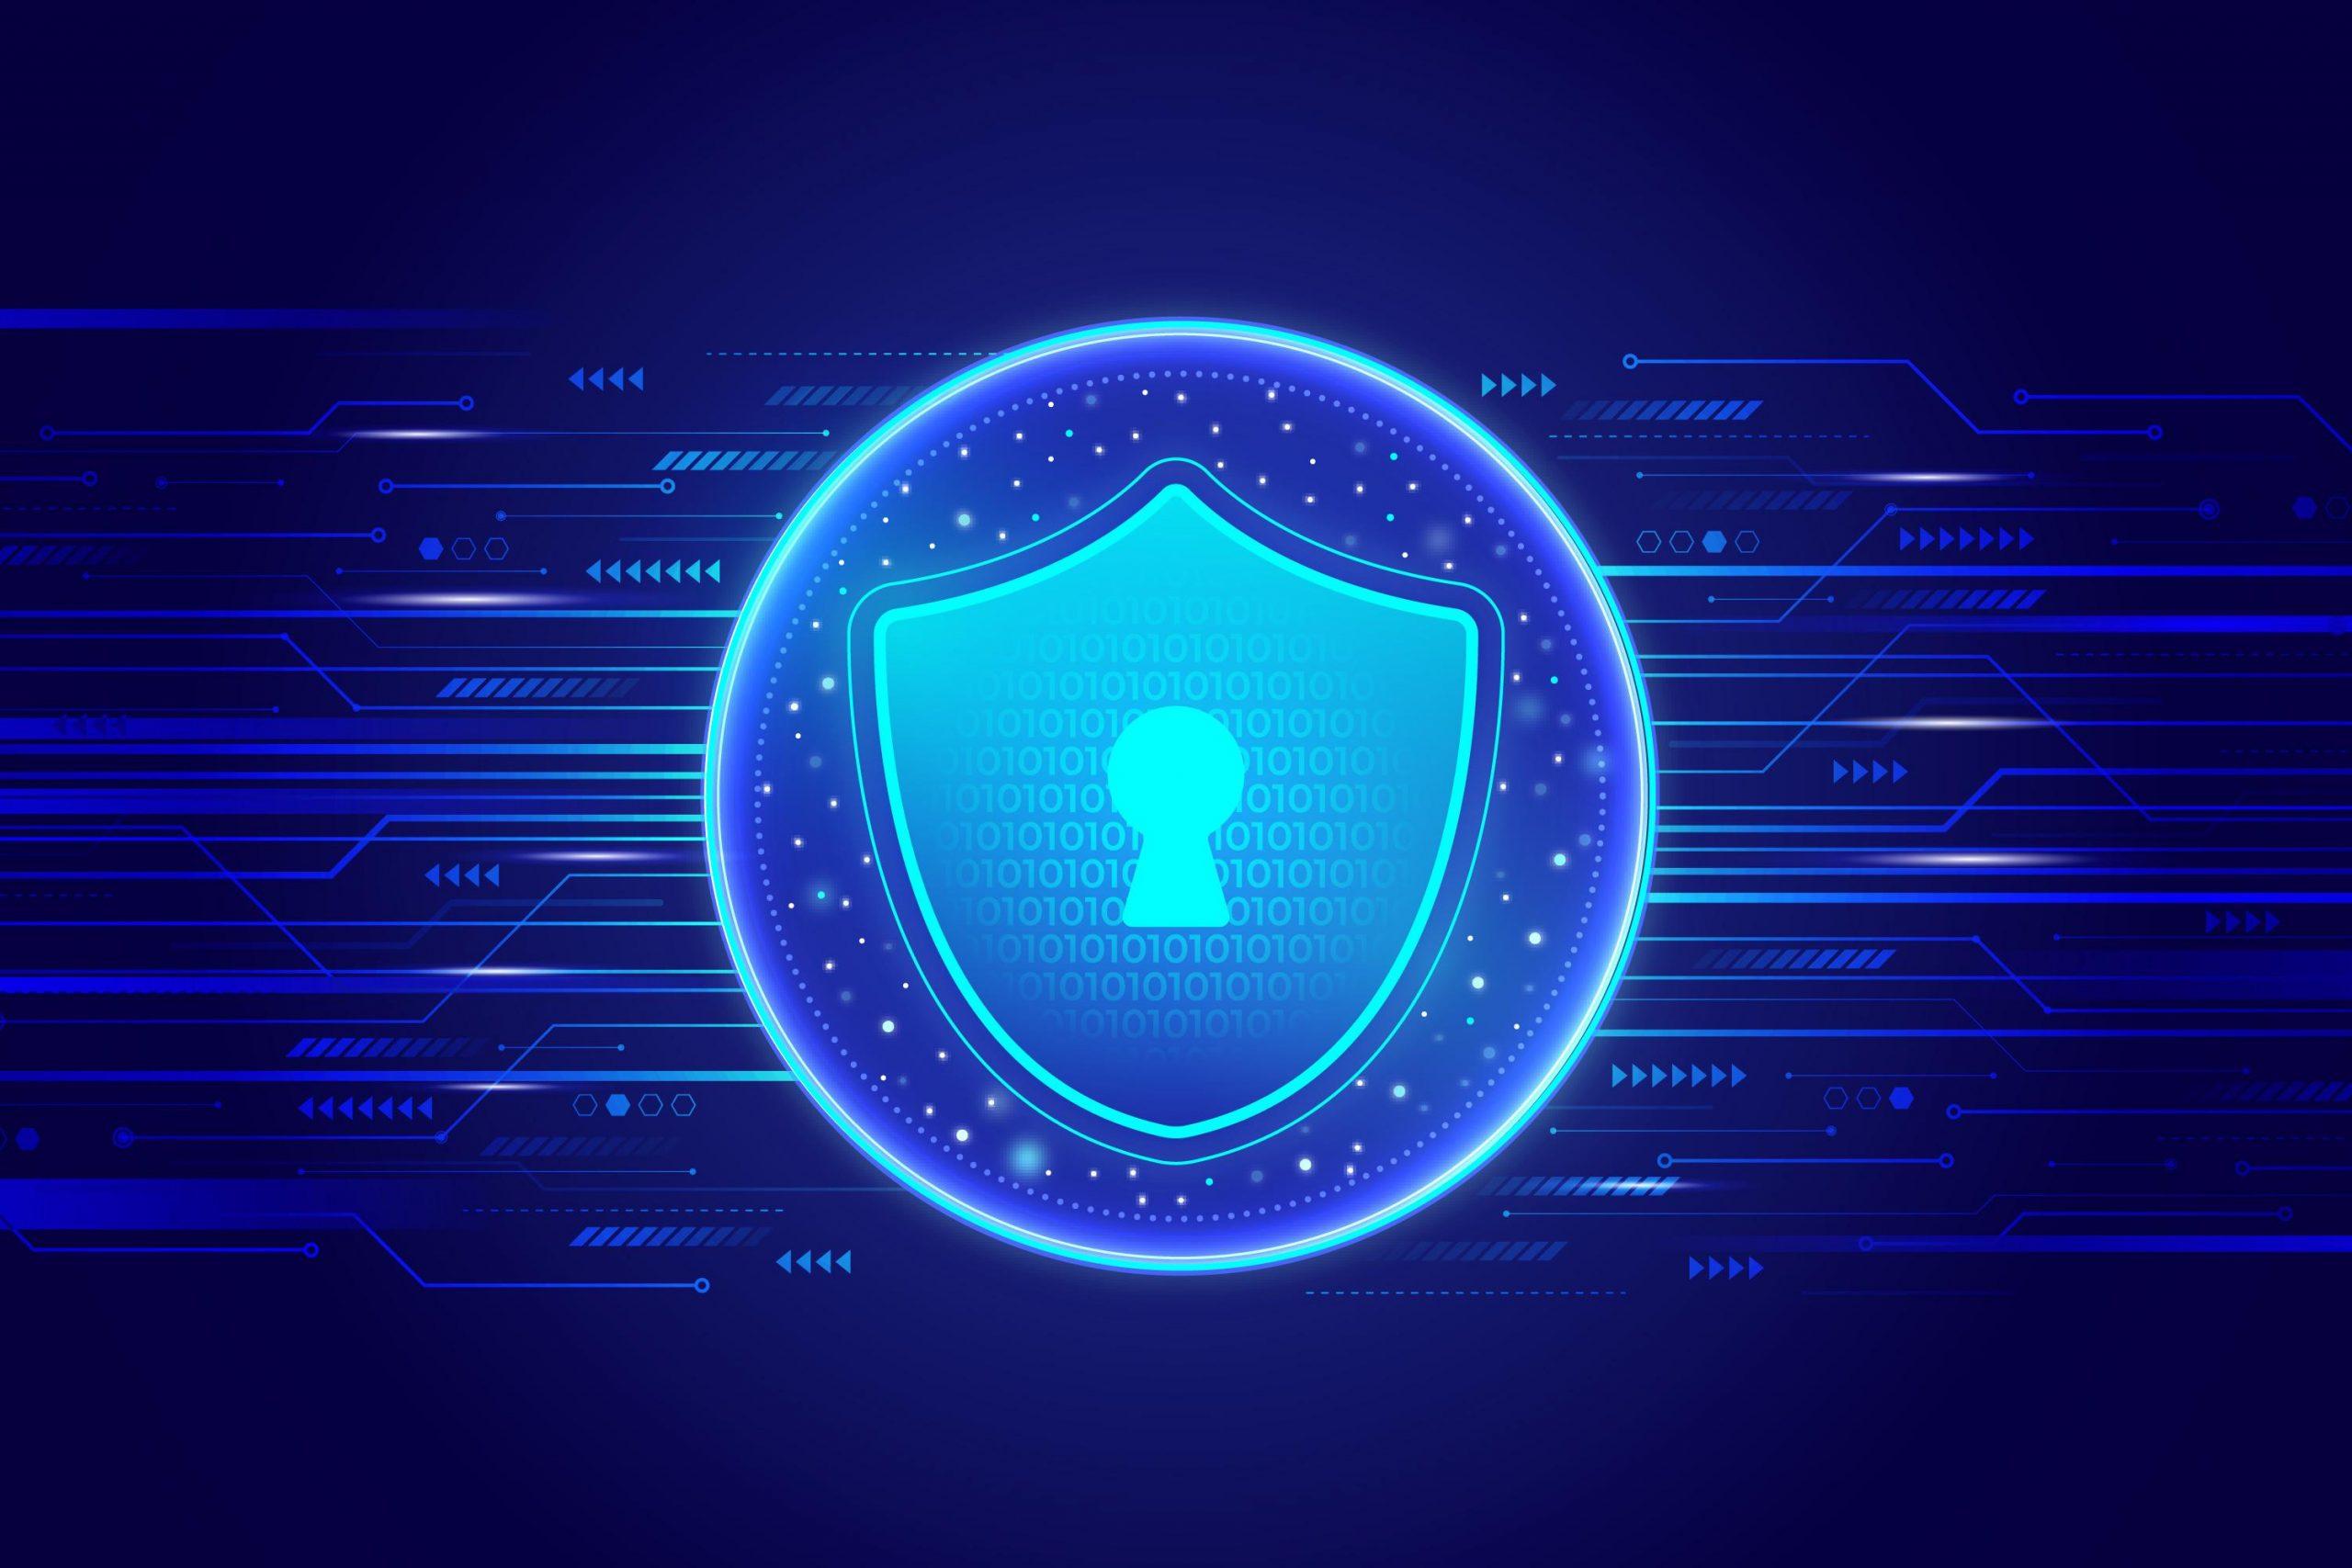 hafnium-attacks-microsoft-exchange-servers